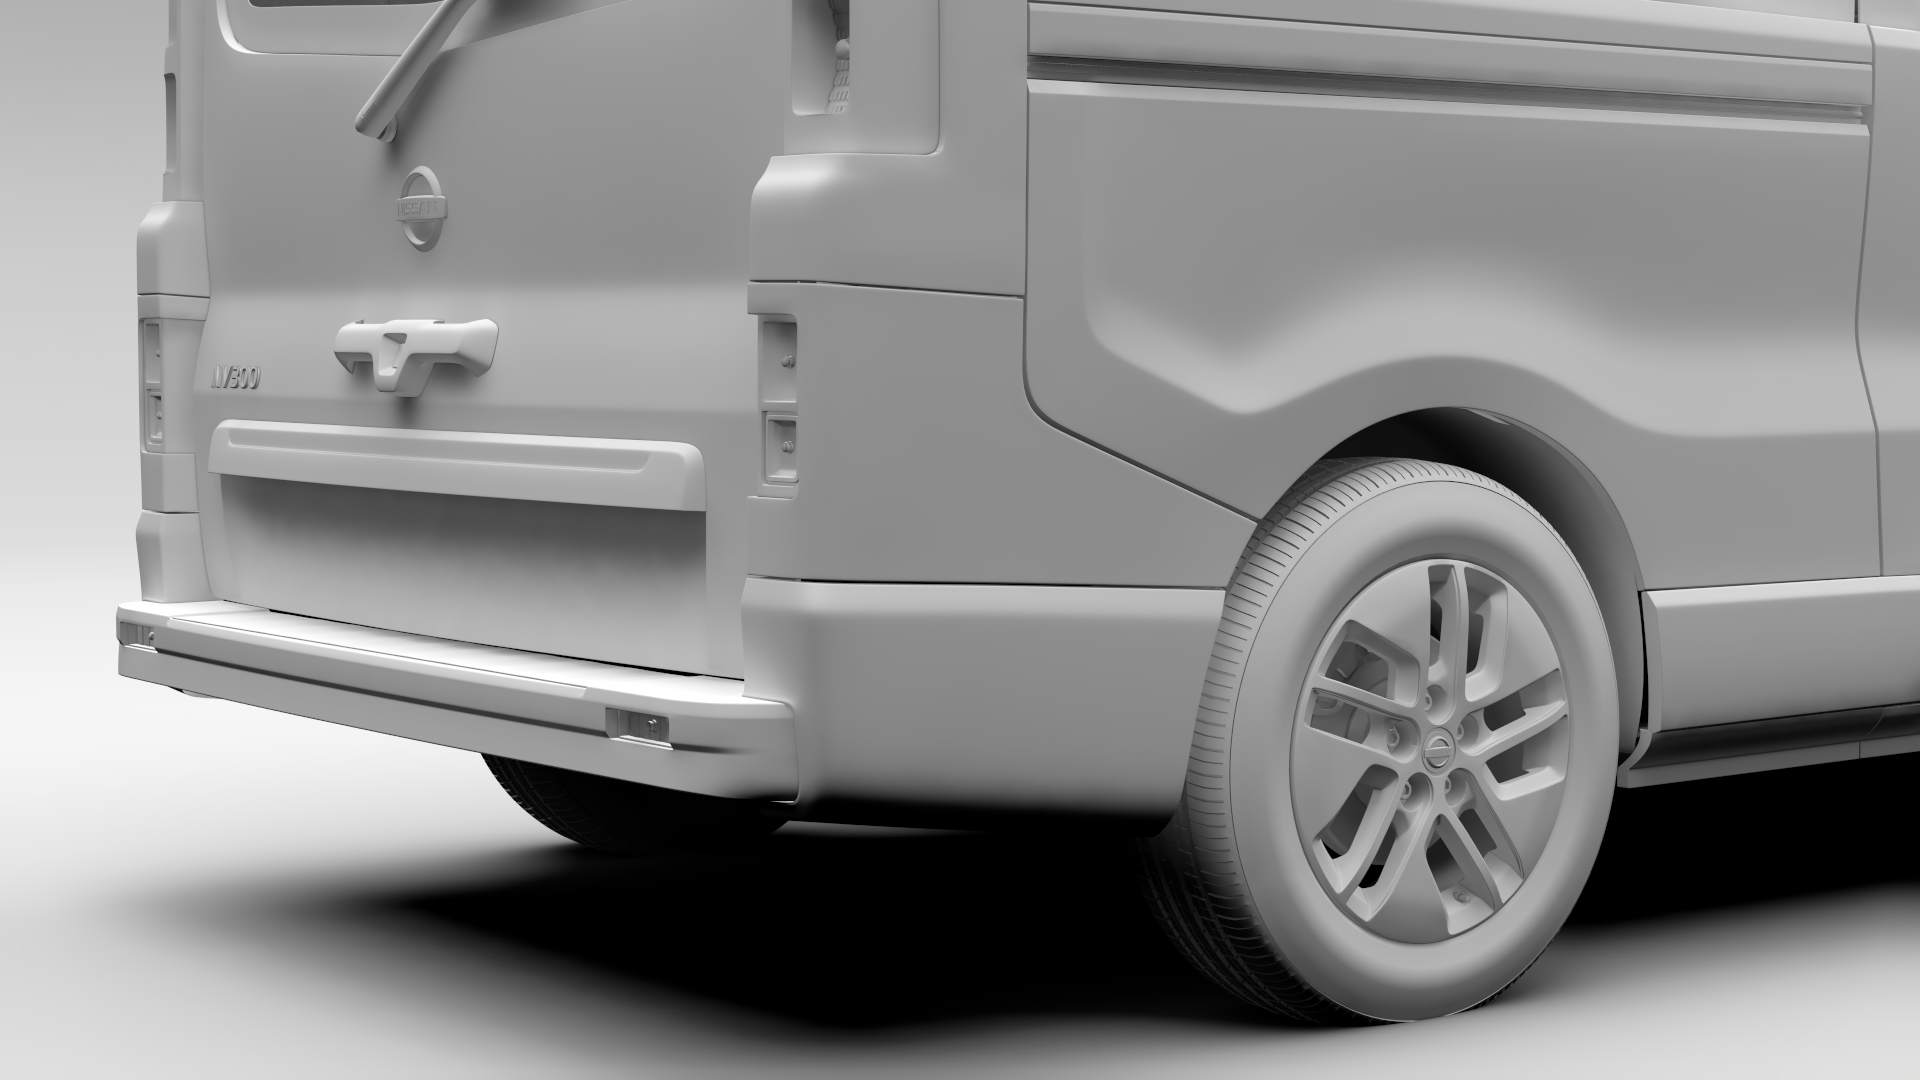 nissan 15 passenger van by nissan nv 300 combi l2h1 2016 by creator 3d 3docean